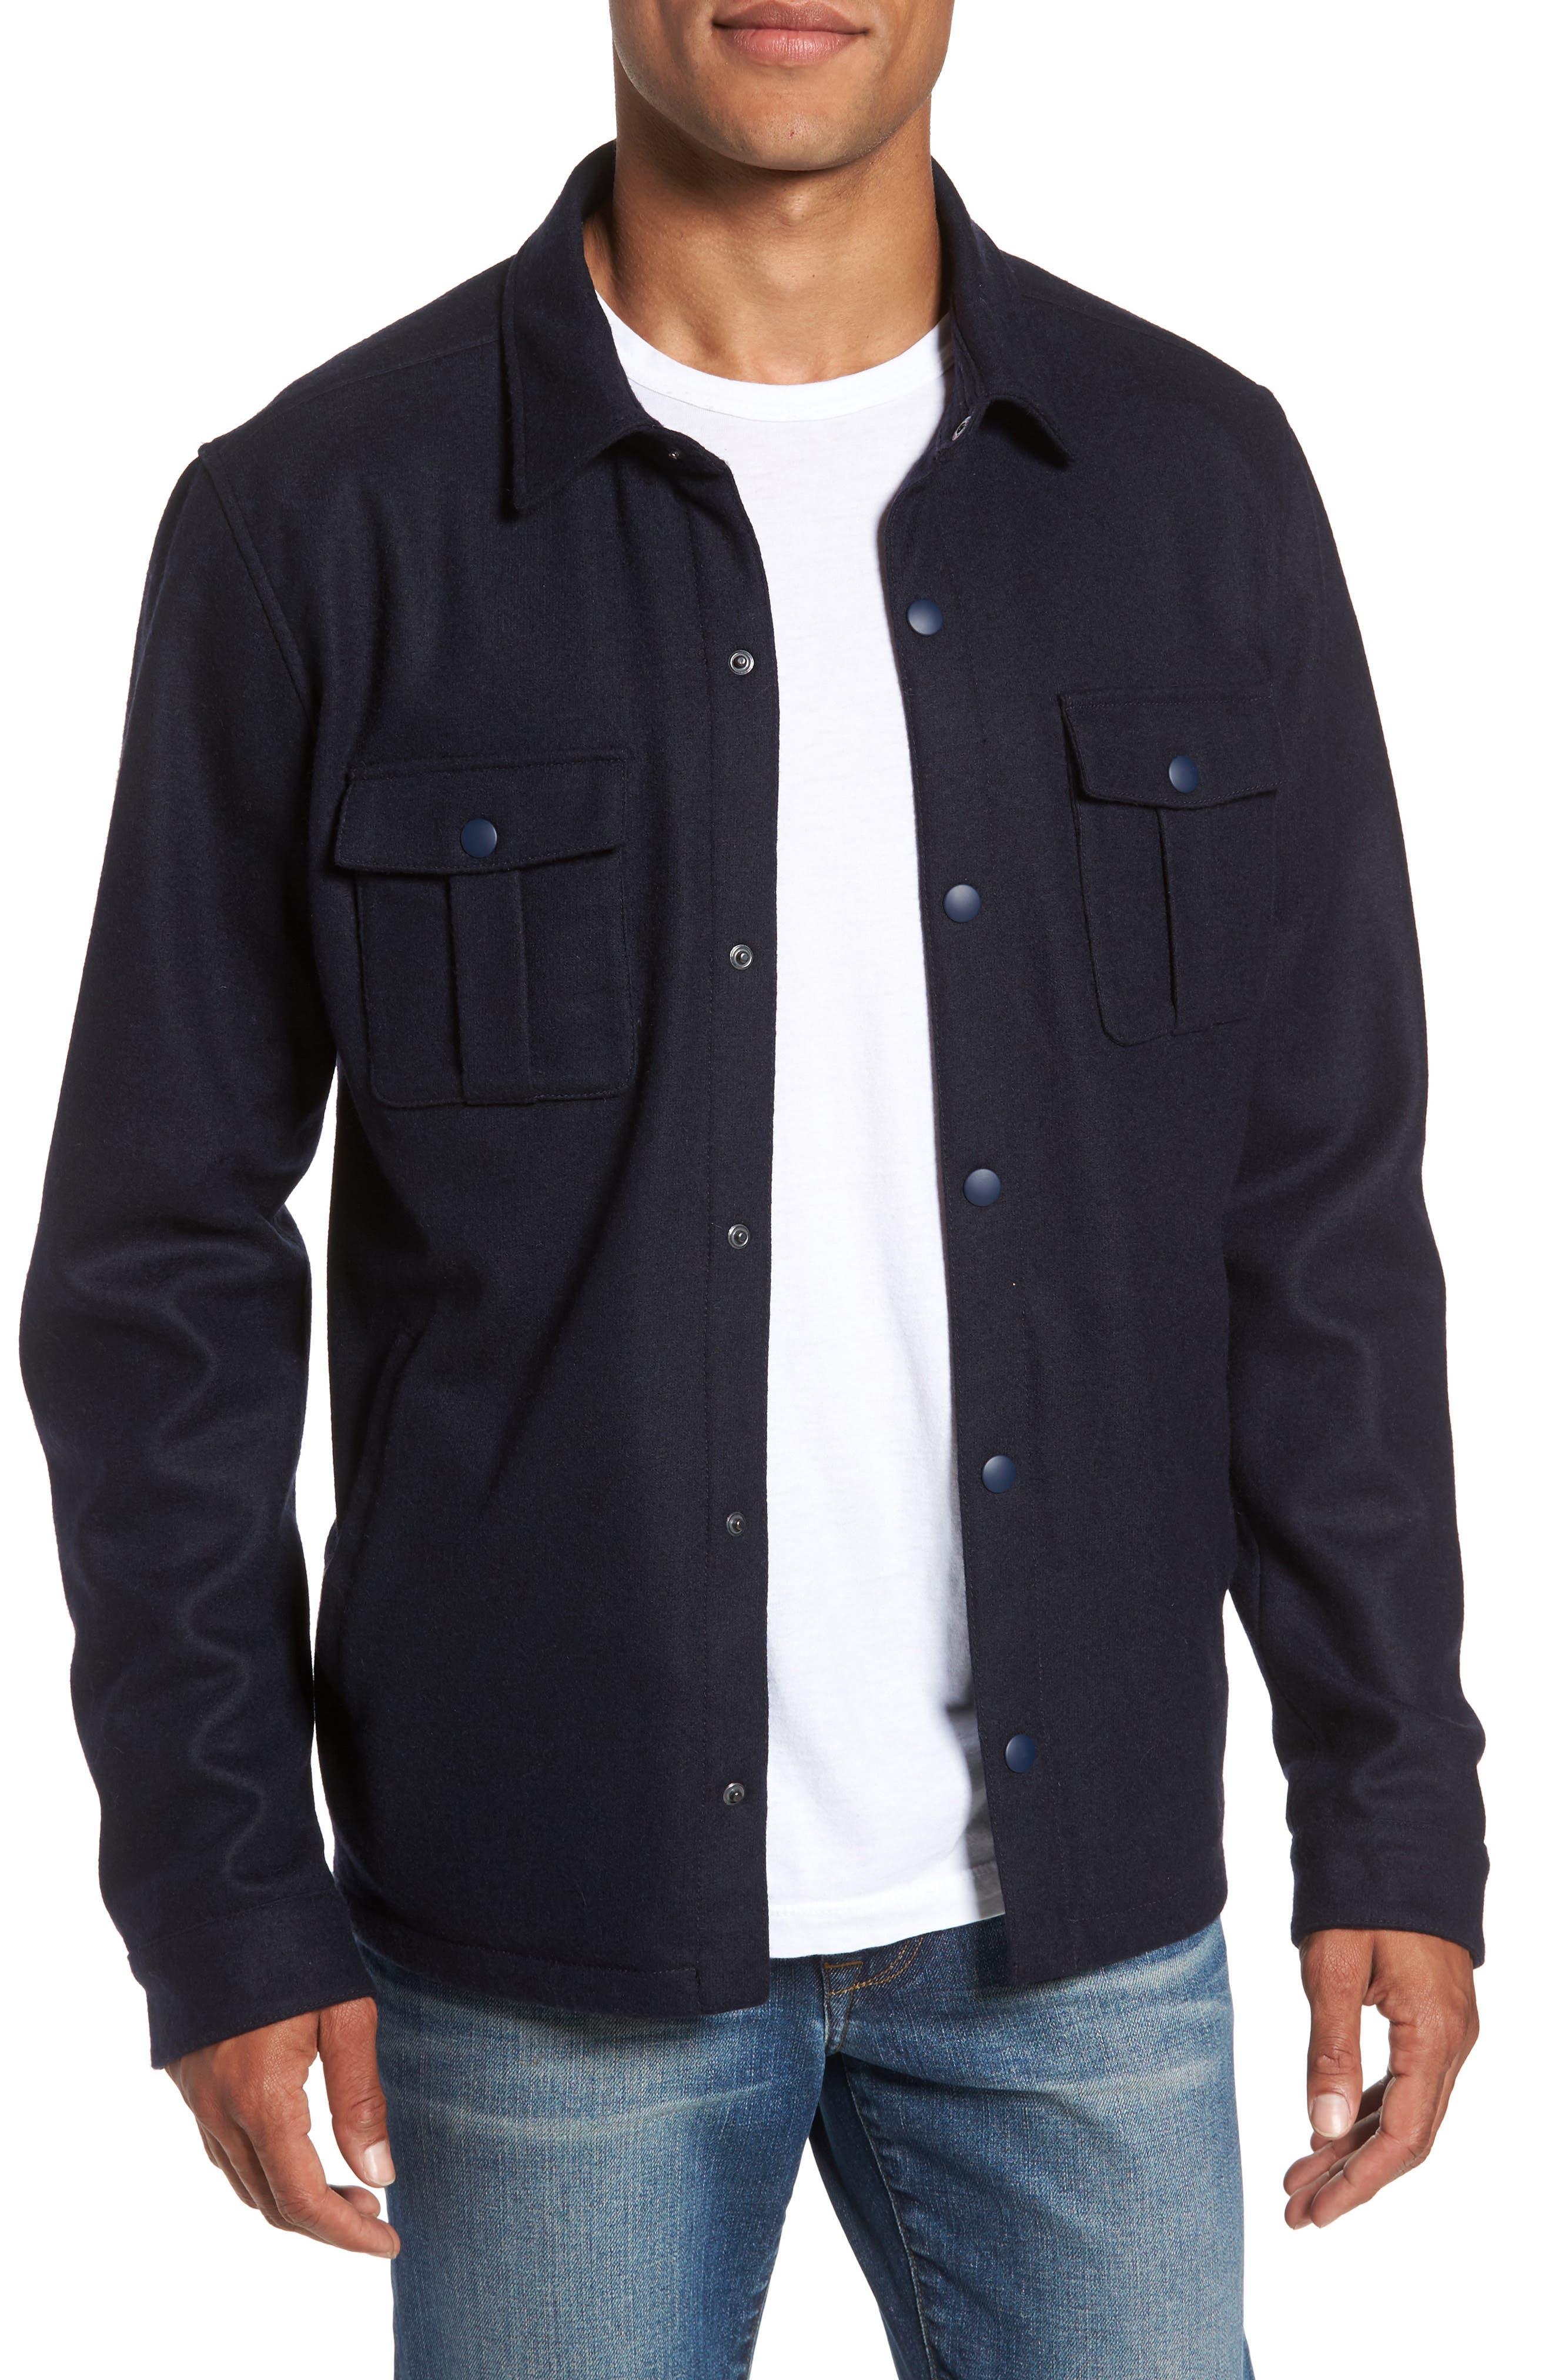 Main Image - Zachary Prell Seymour Shirt Jacket